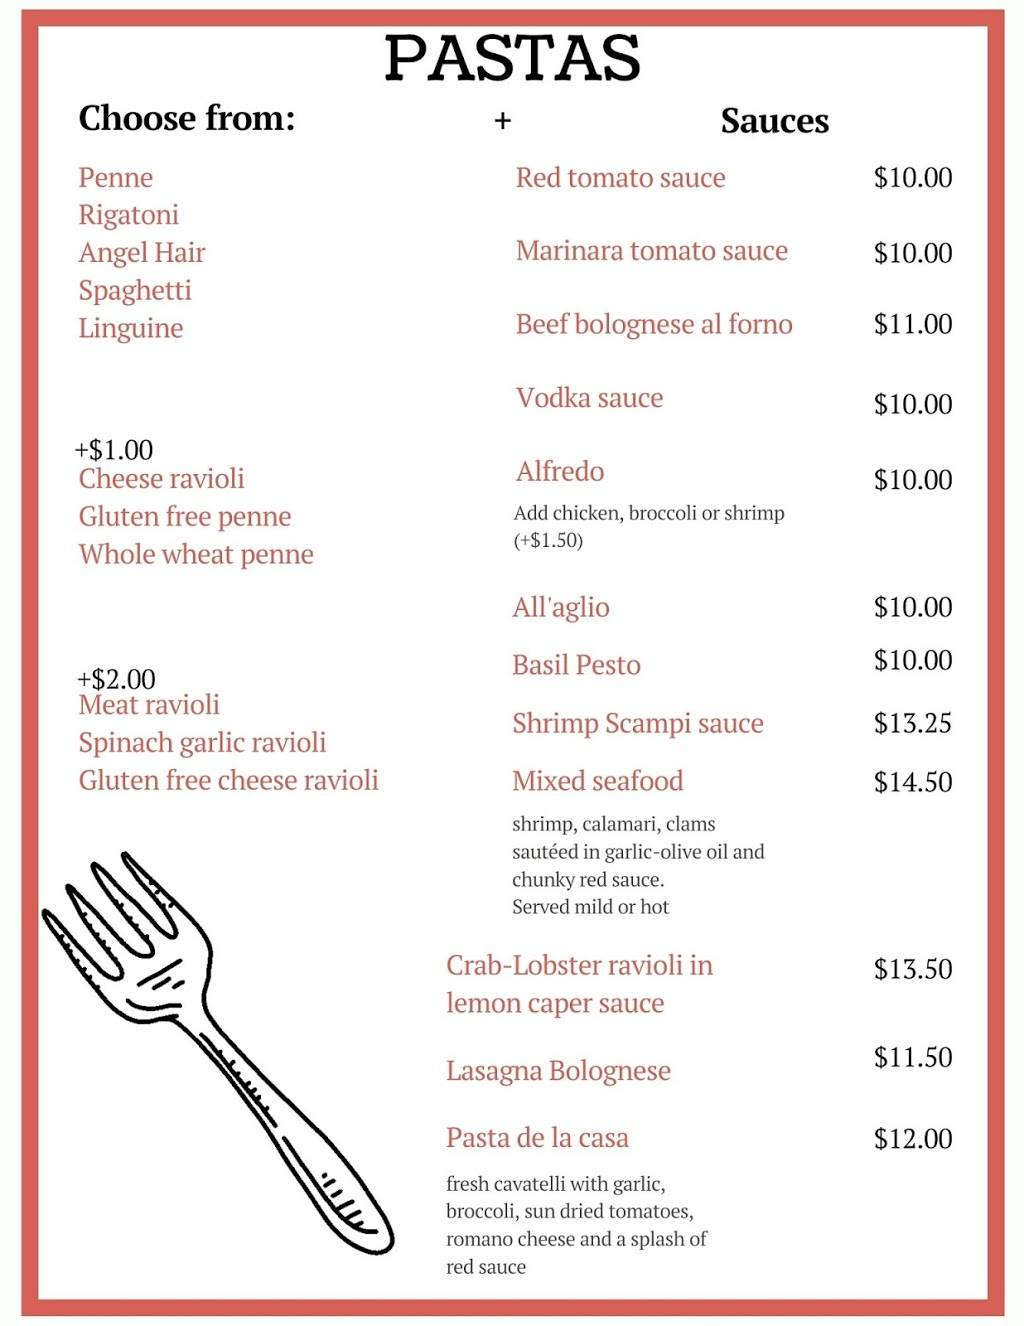 Priceburg Pizza | restaurant | 800 Main St, Dickson City, PA 18519, USA | 5703828646 OR +1 570-382-8646